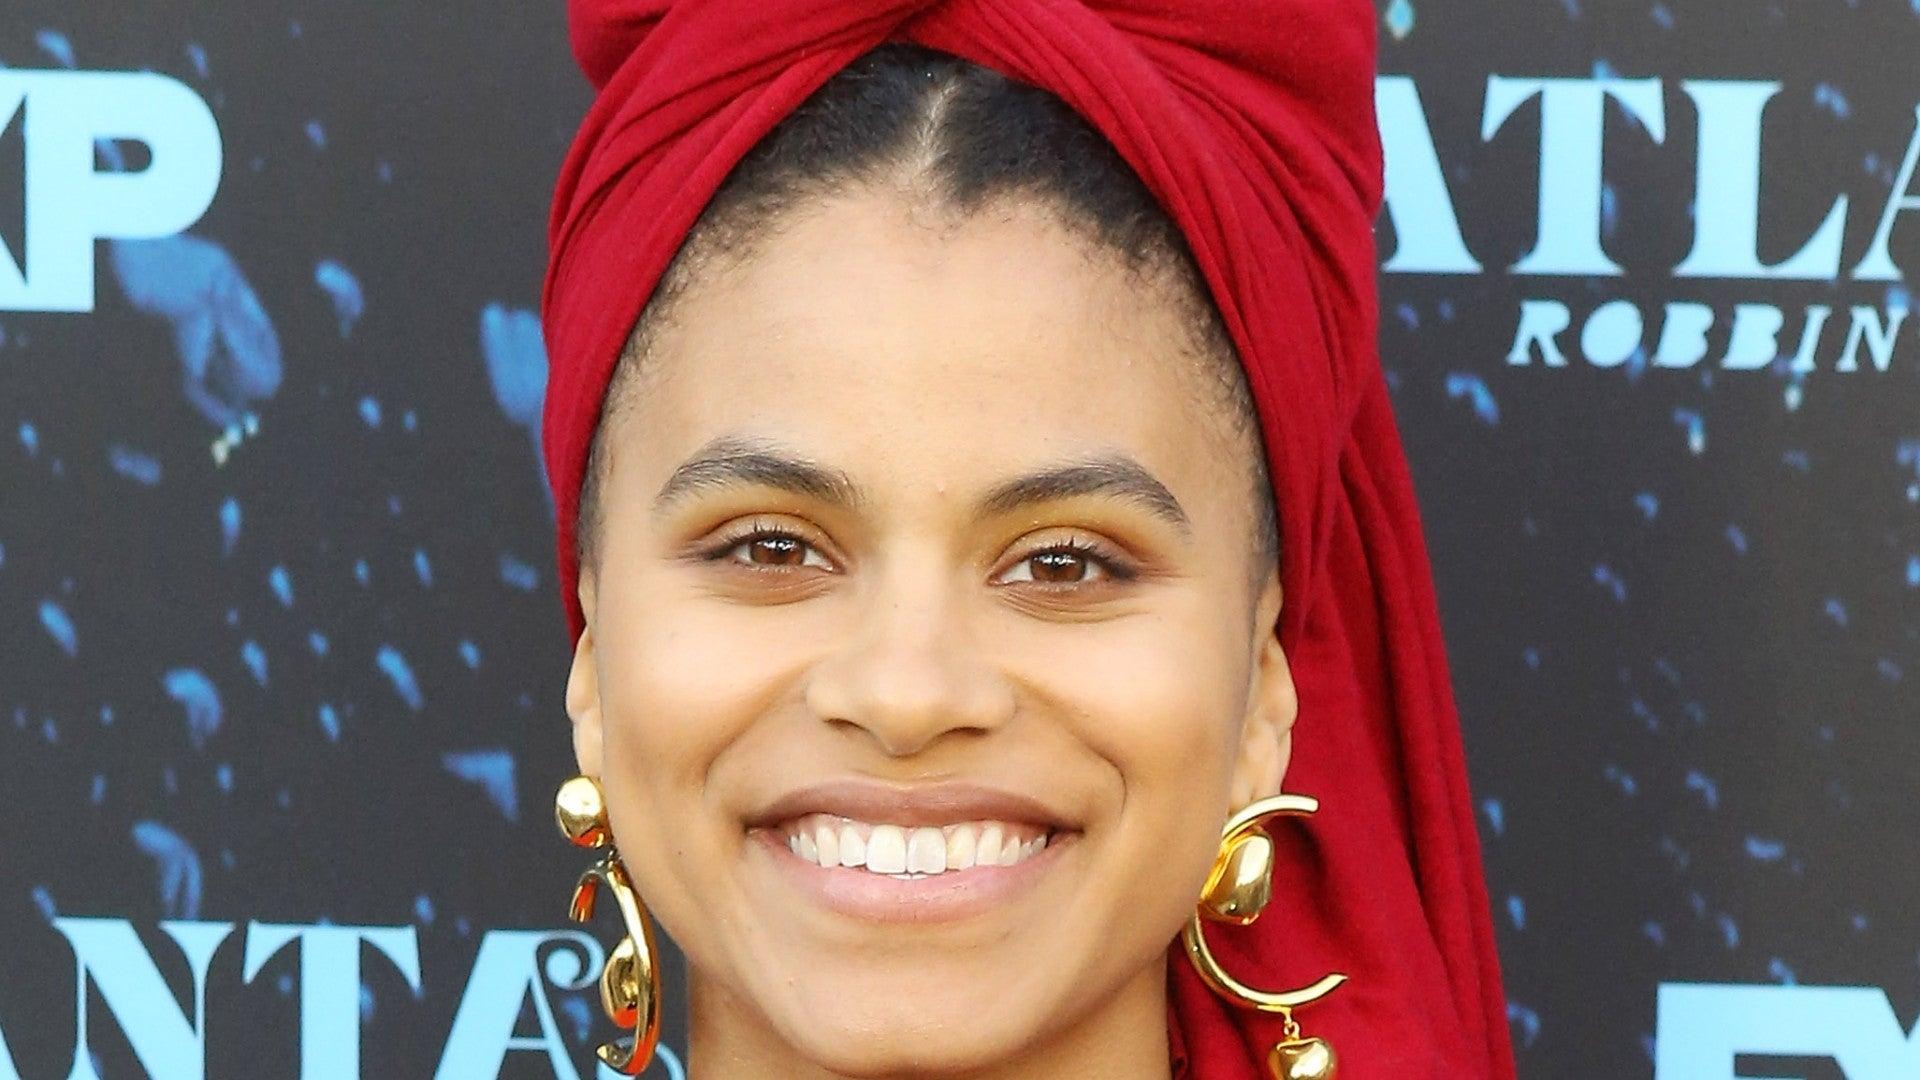 Zazie Beetz Rocks An Amazing Afro At The Venice Film Festival